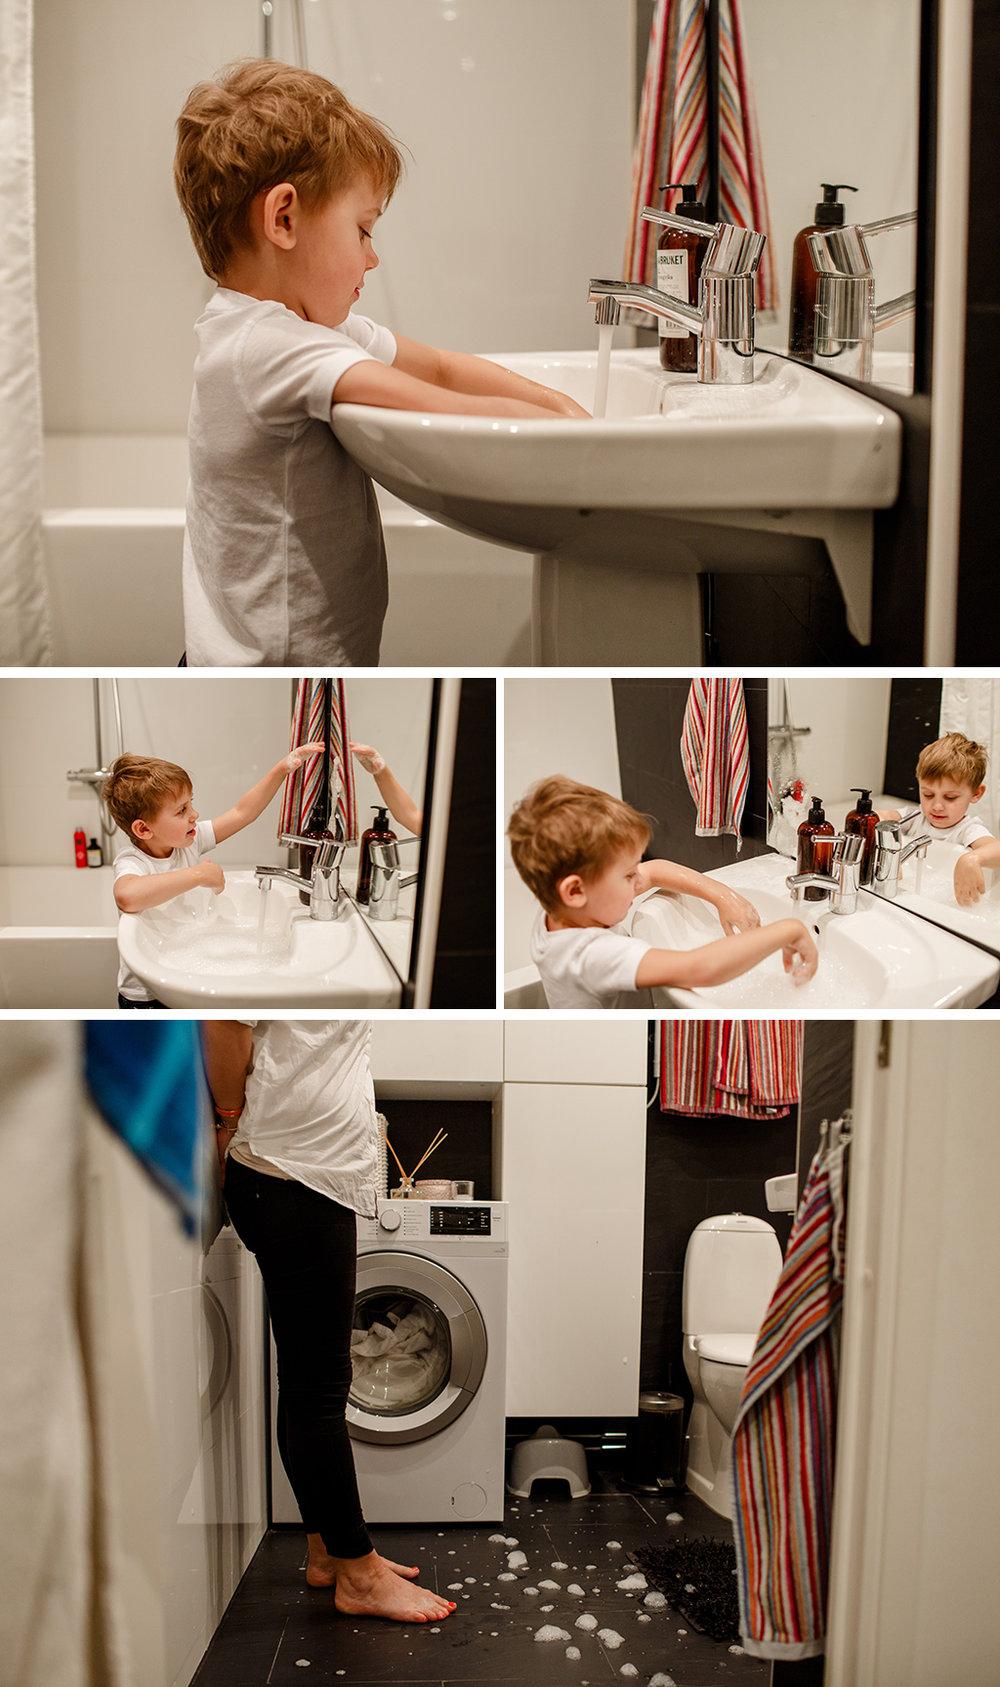 Lifestyle-nyfoddfotografering_newbornphotography_familjefotograf_Stockholm_12.jpg